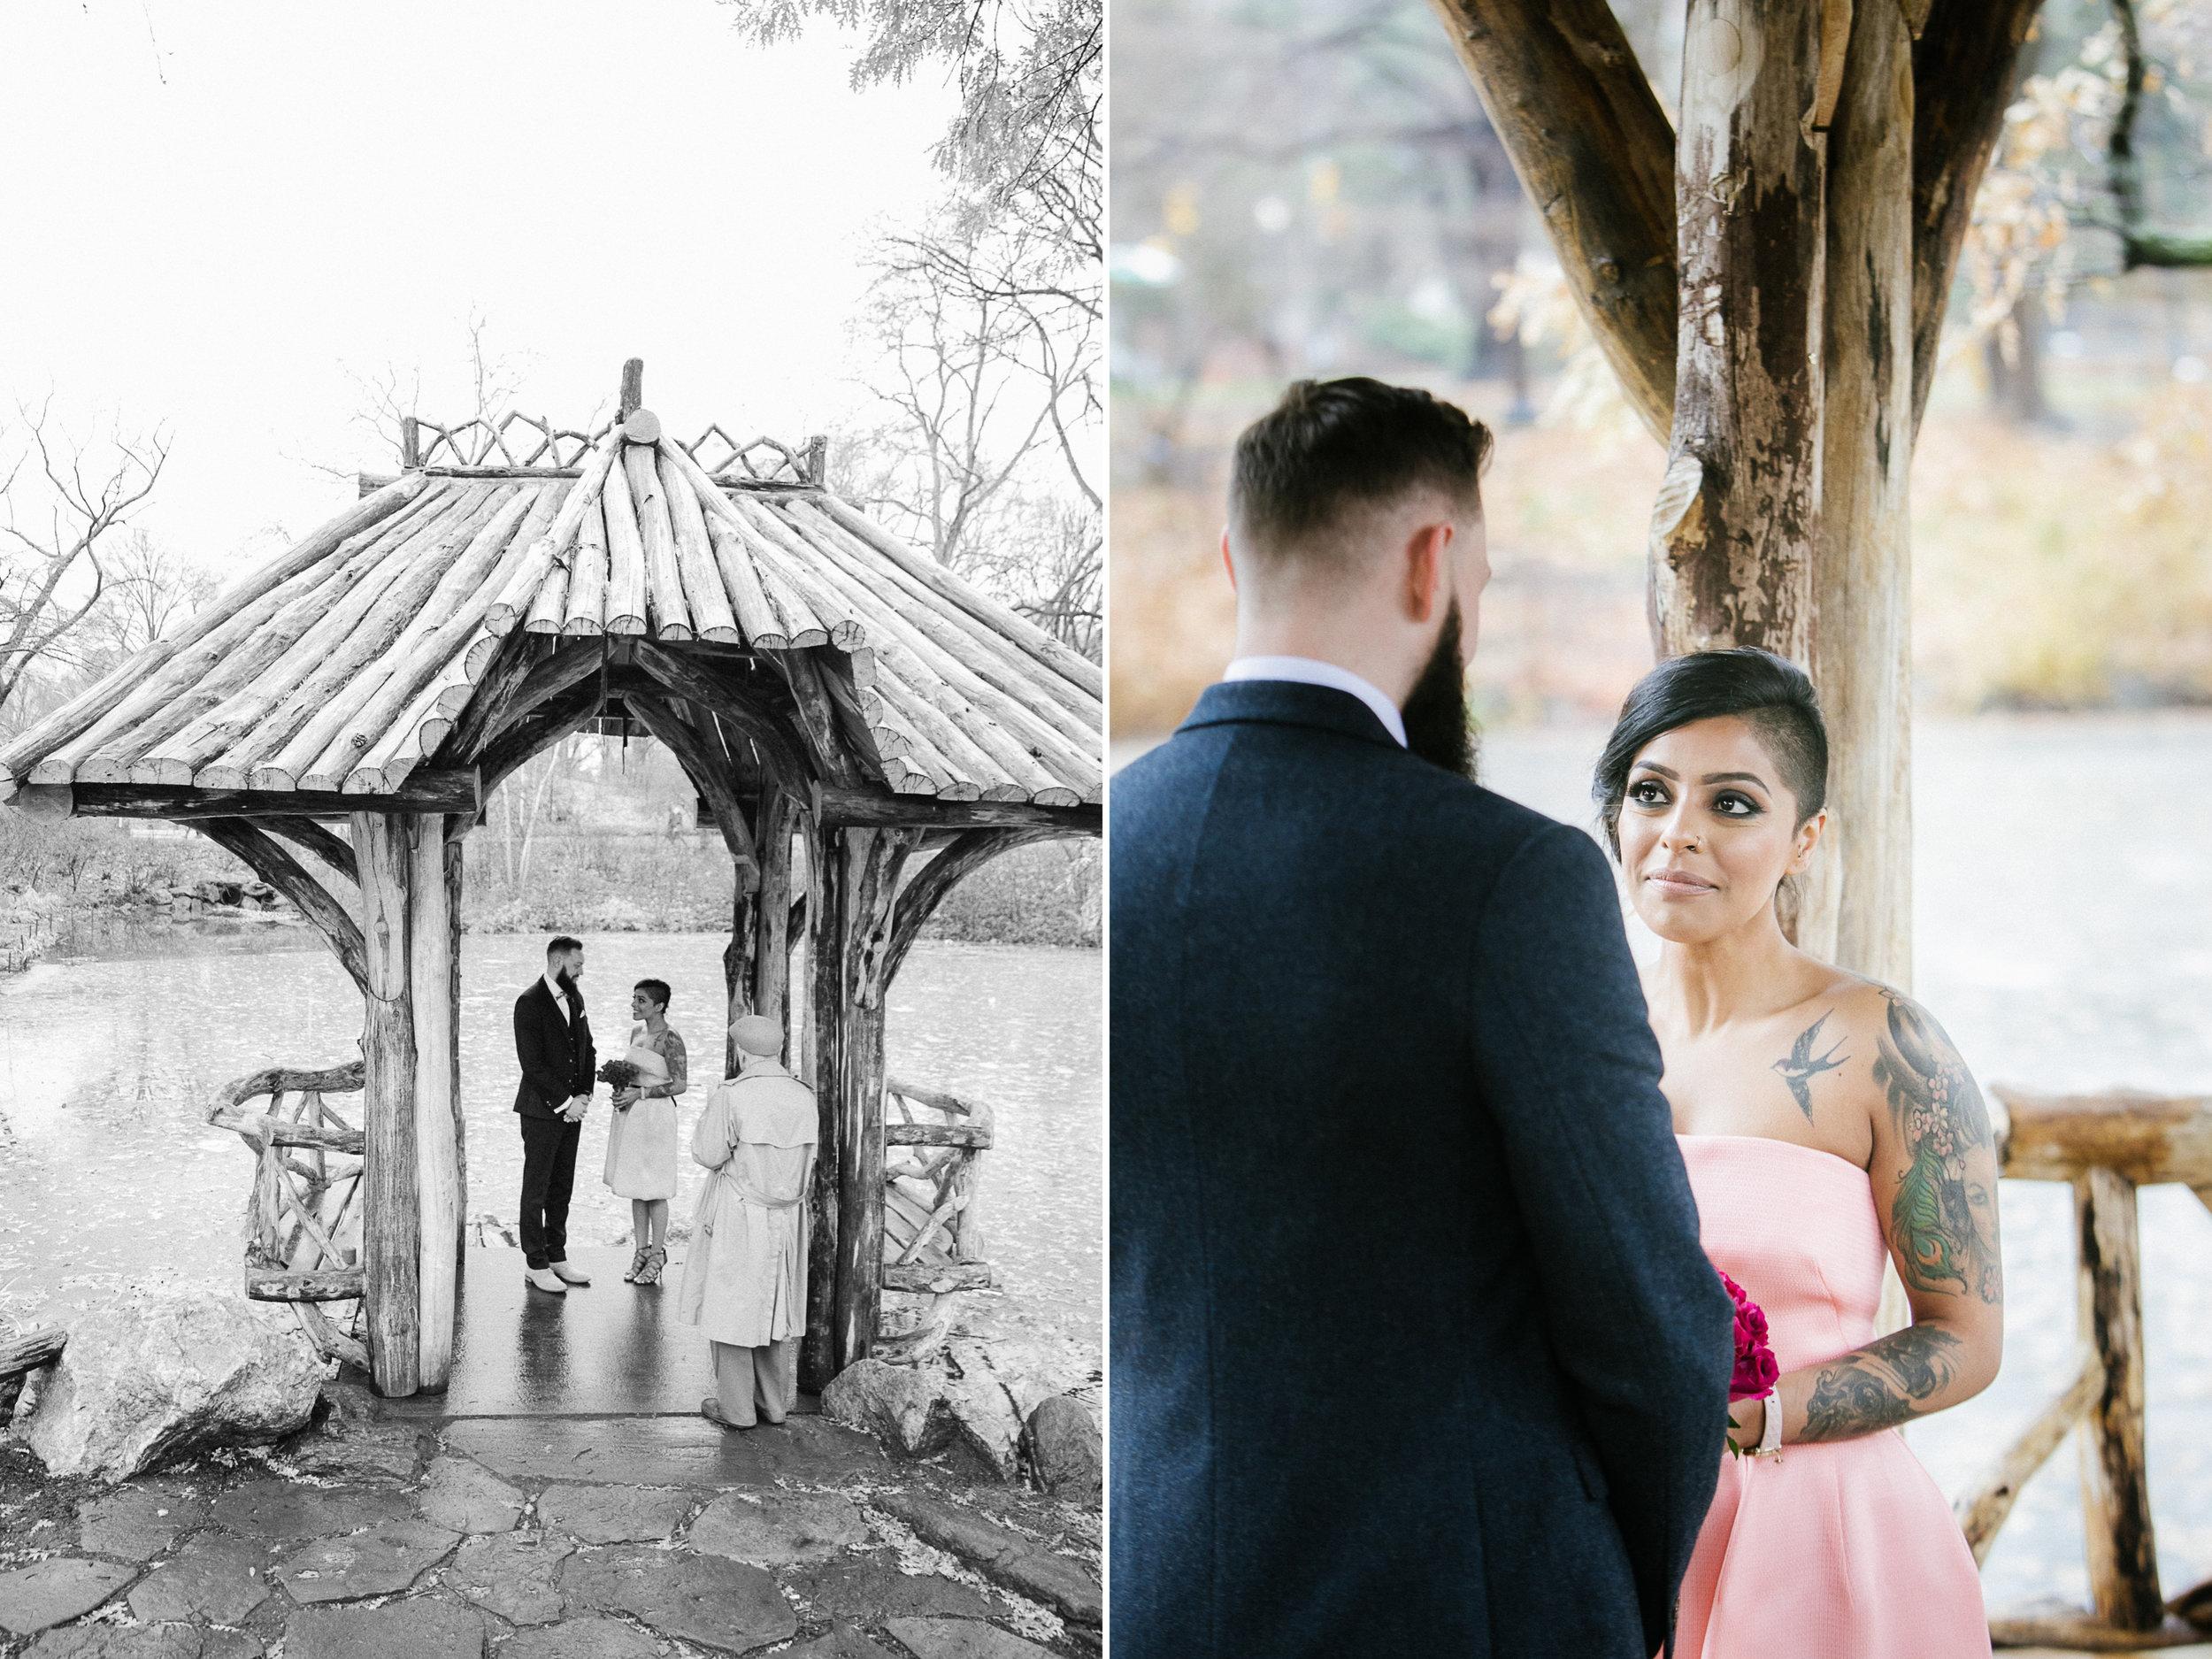 Central-park-wedding-S&K-1.jpg